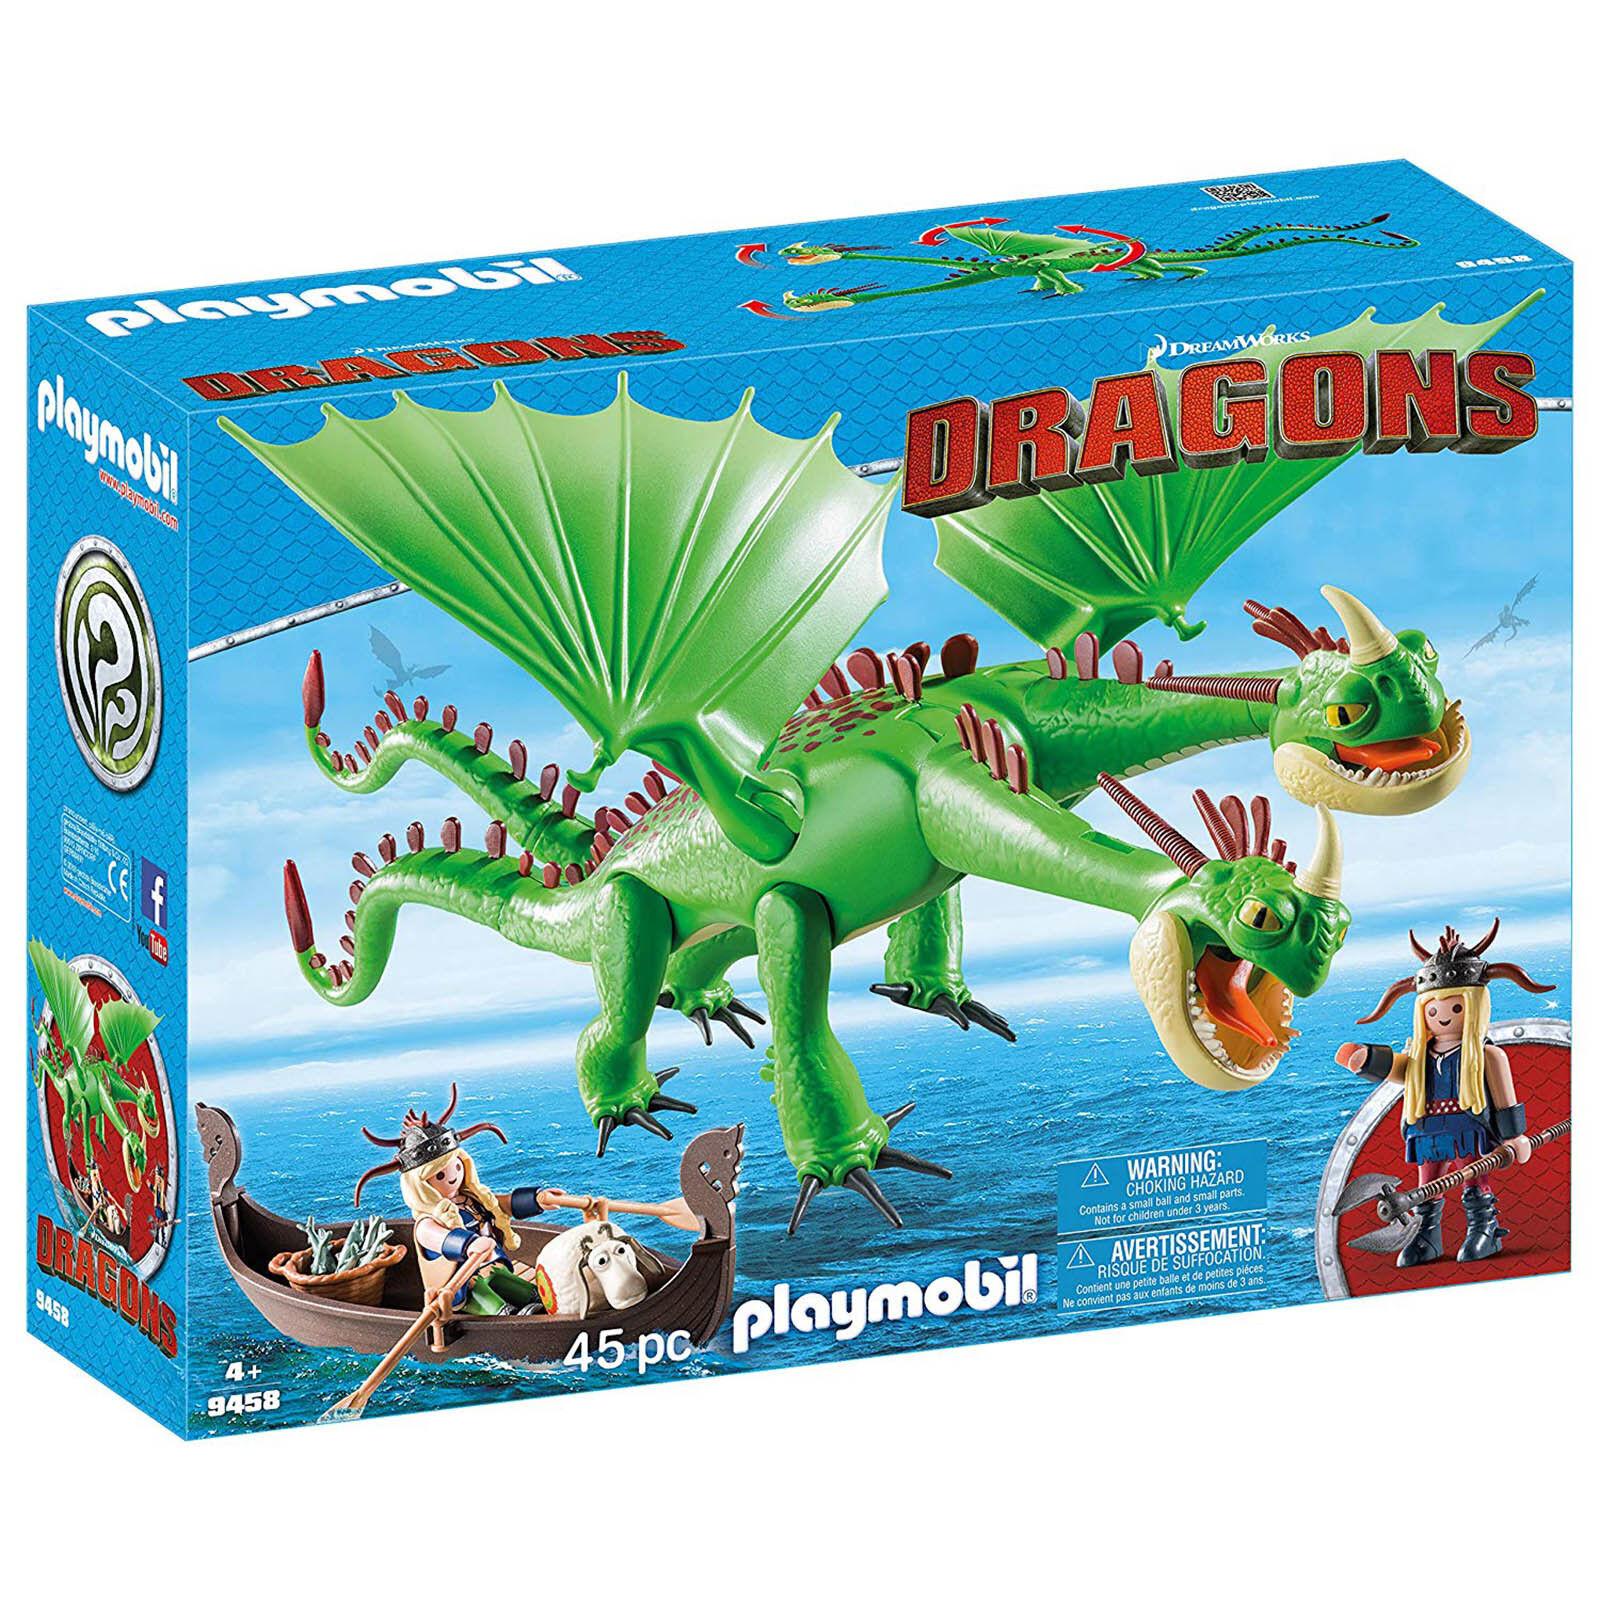 Playmobil Dragons Ruffnut And Tuffnut Building Set 9458 NEW Toys Kids